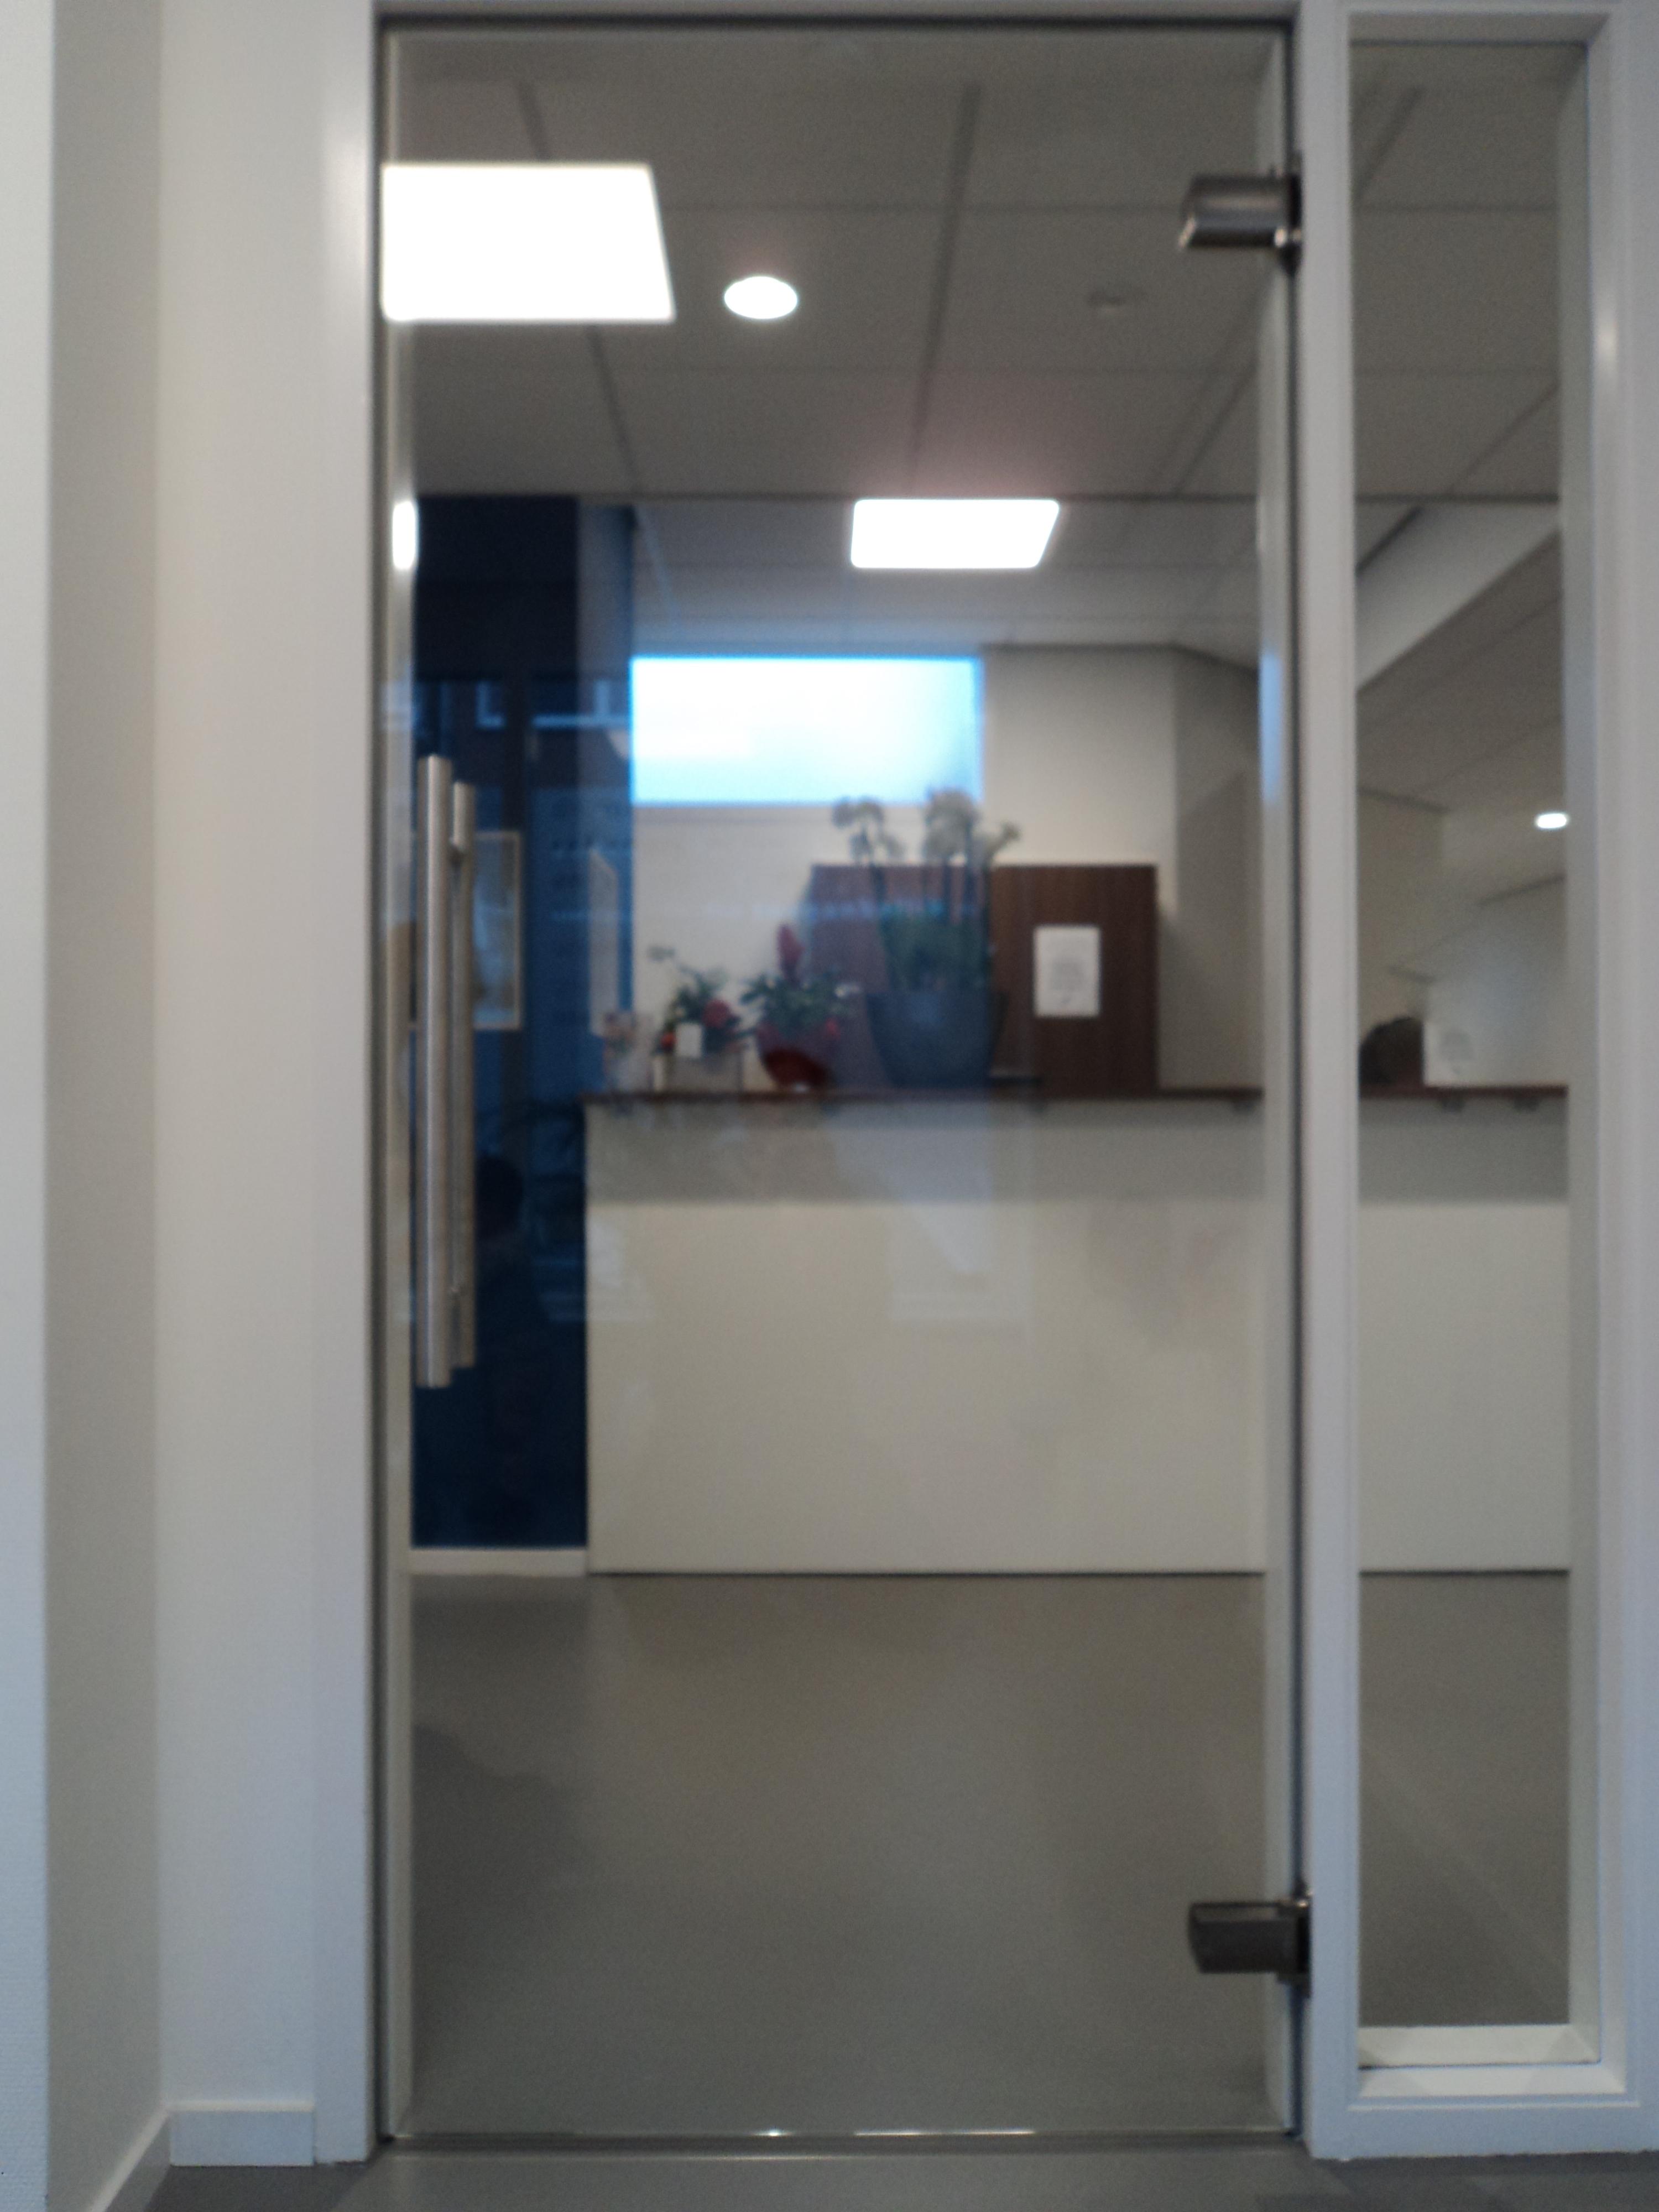 https://www.glashandelariba.nl/wp-content/uploads/2016/11/glazen-deur-den-haag.jpg